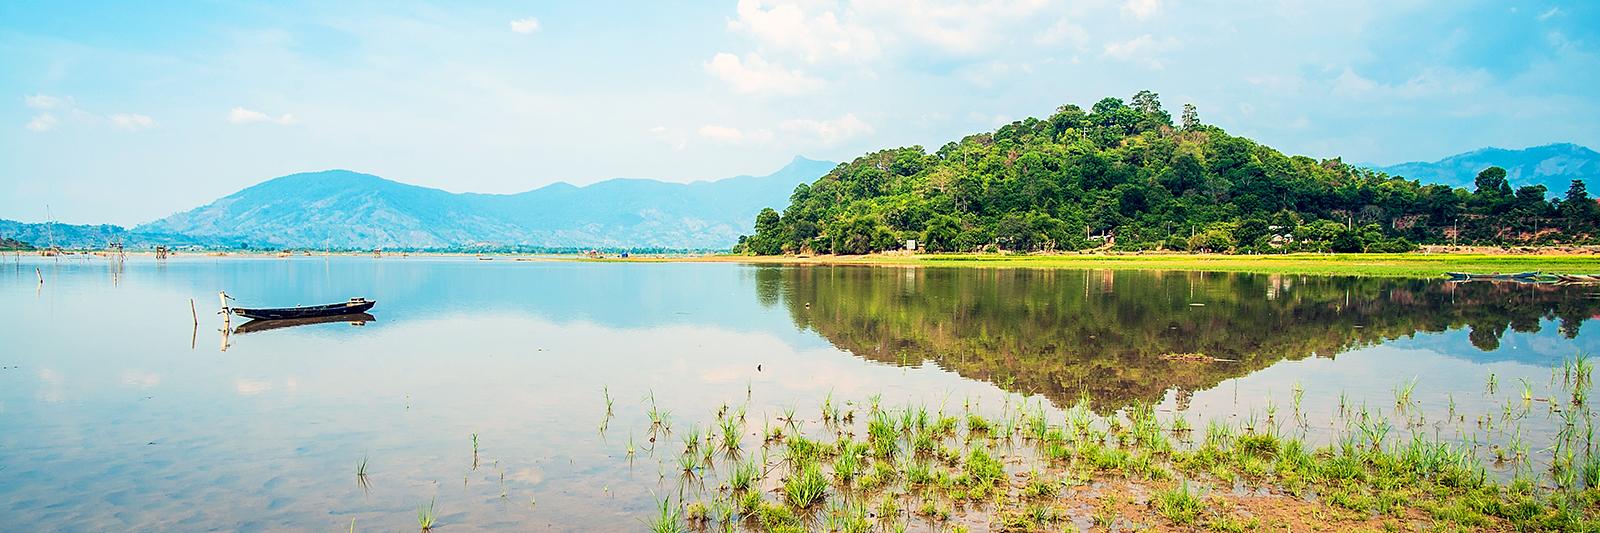 Bao Dai Villa - Lac Lak